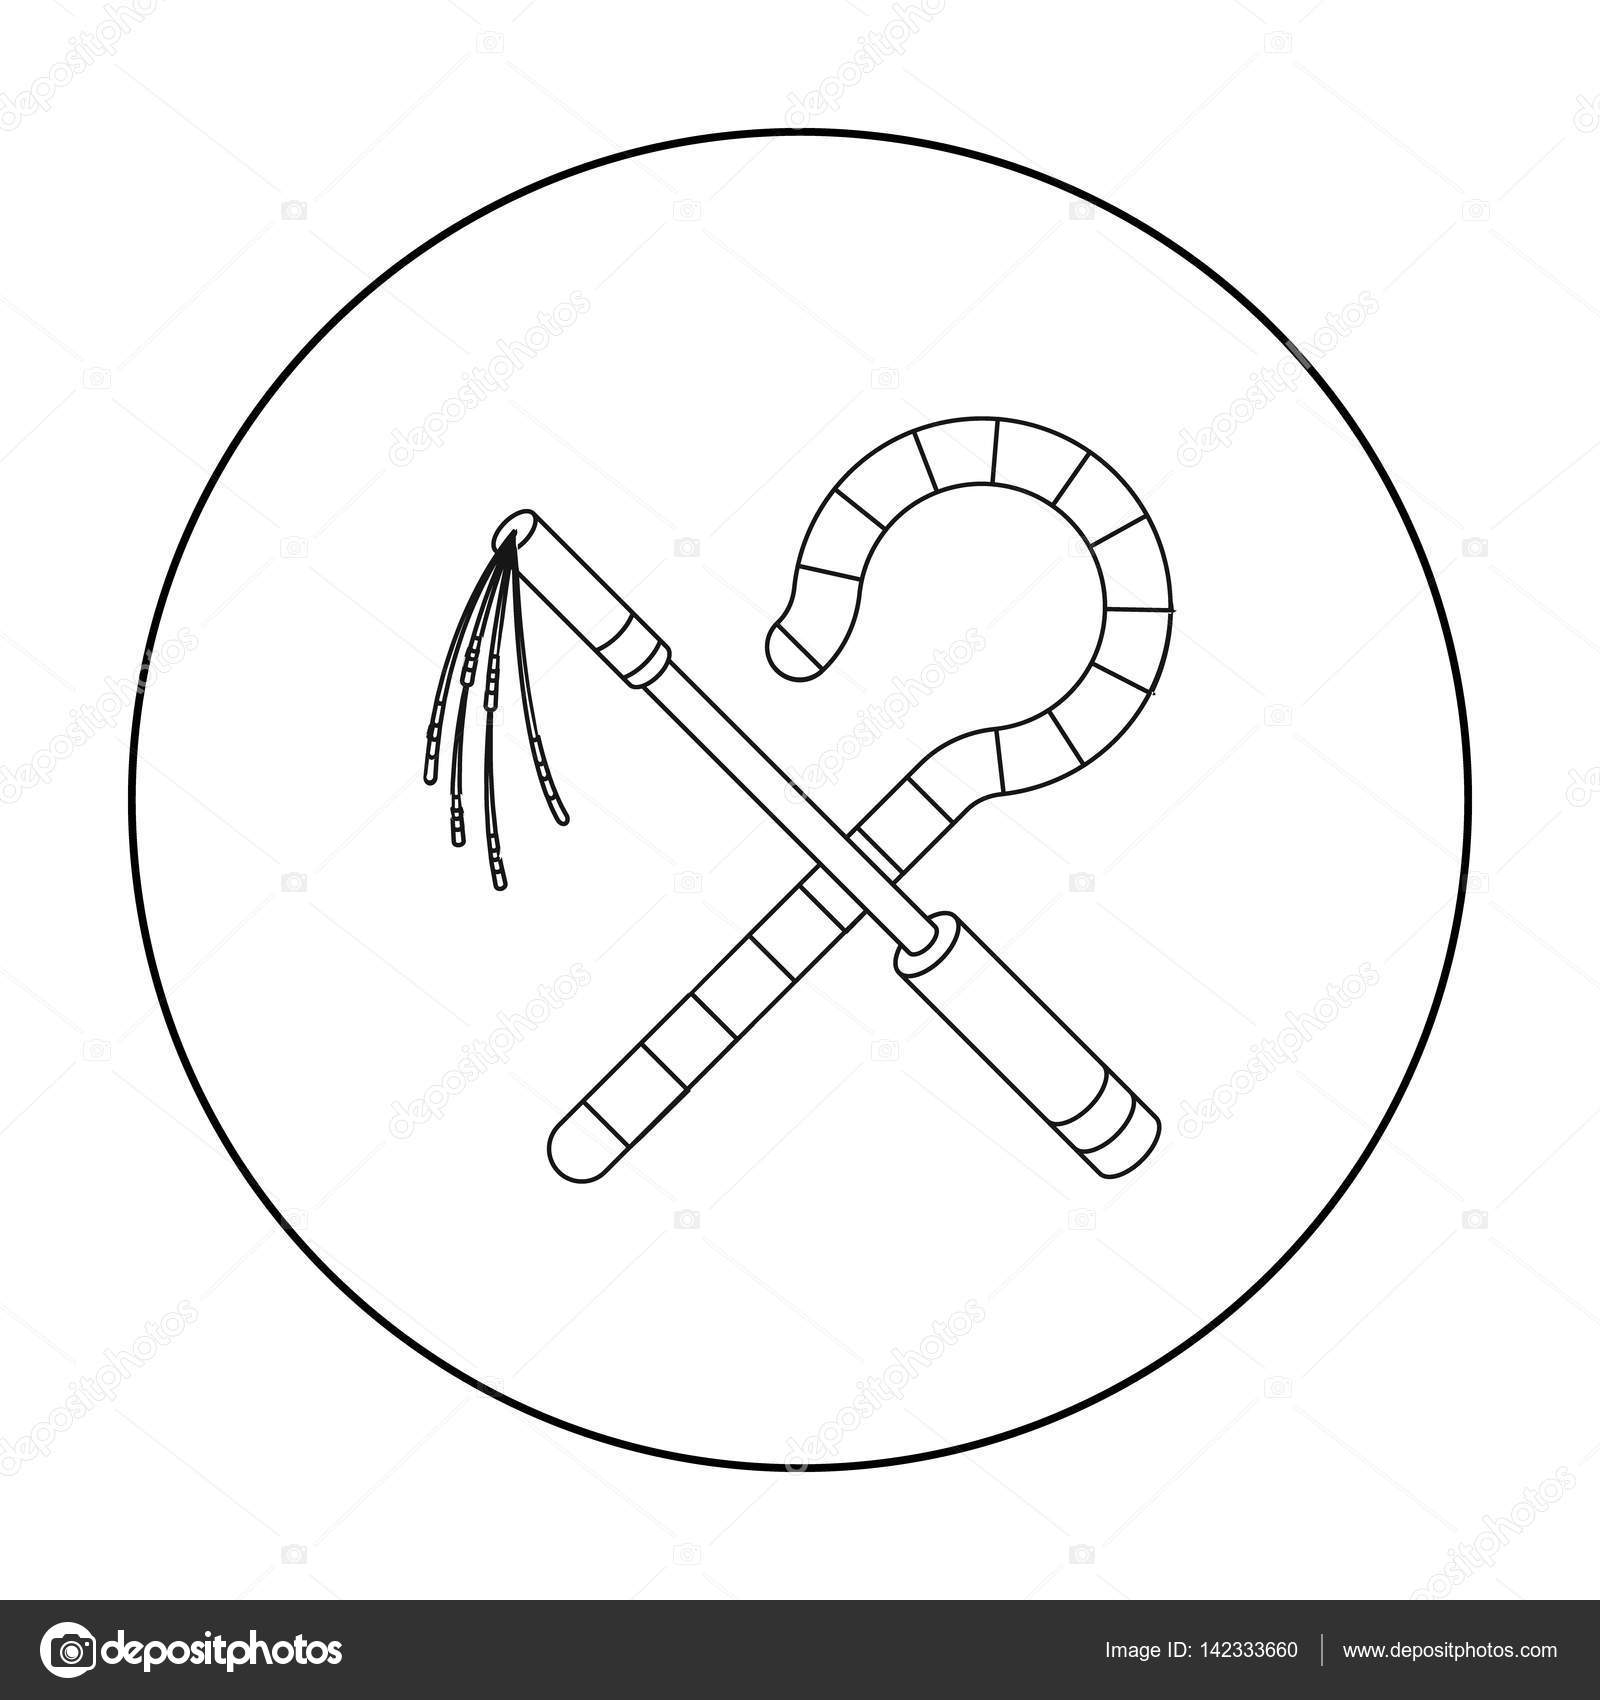 Bandido e malho cone no estilo de contorno isolado no fundo branco bandido e malho cone no estilo de contorno isolado no fundo branco ilustrao em vetor antiga egito smbolo vetor de pandavector ccuart Images